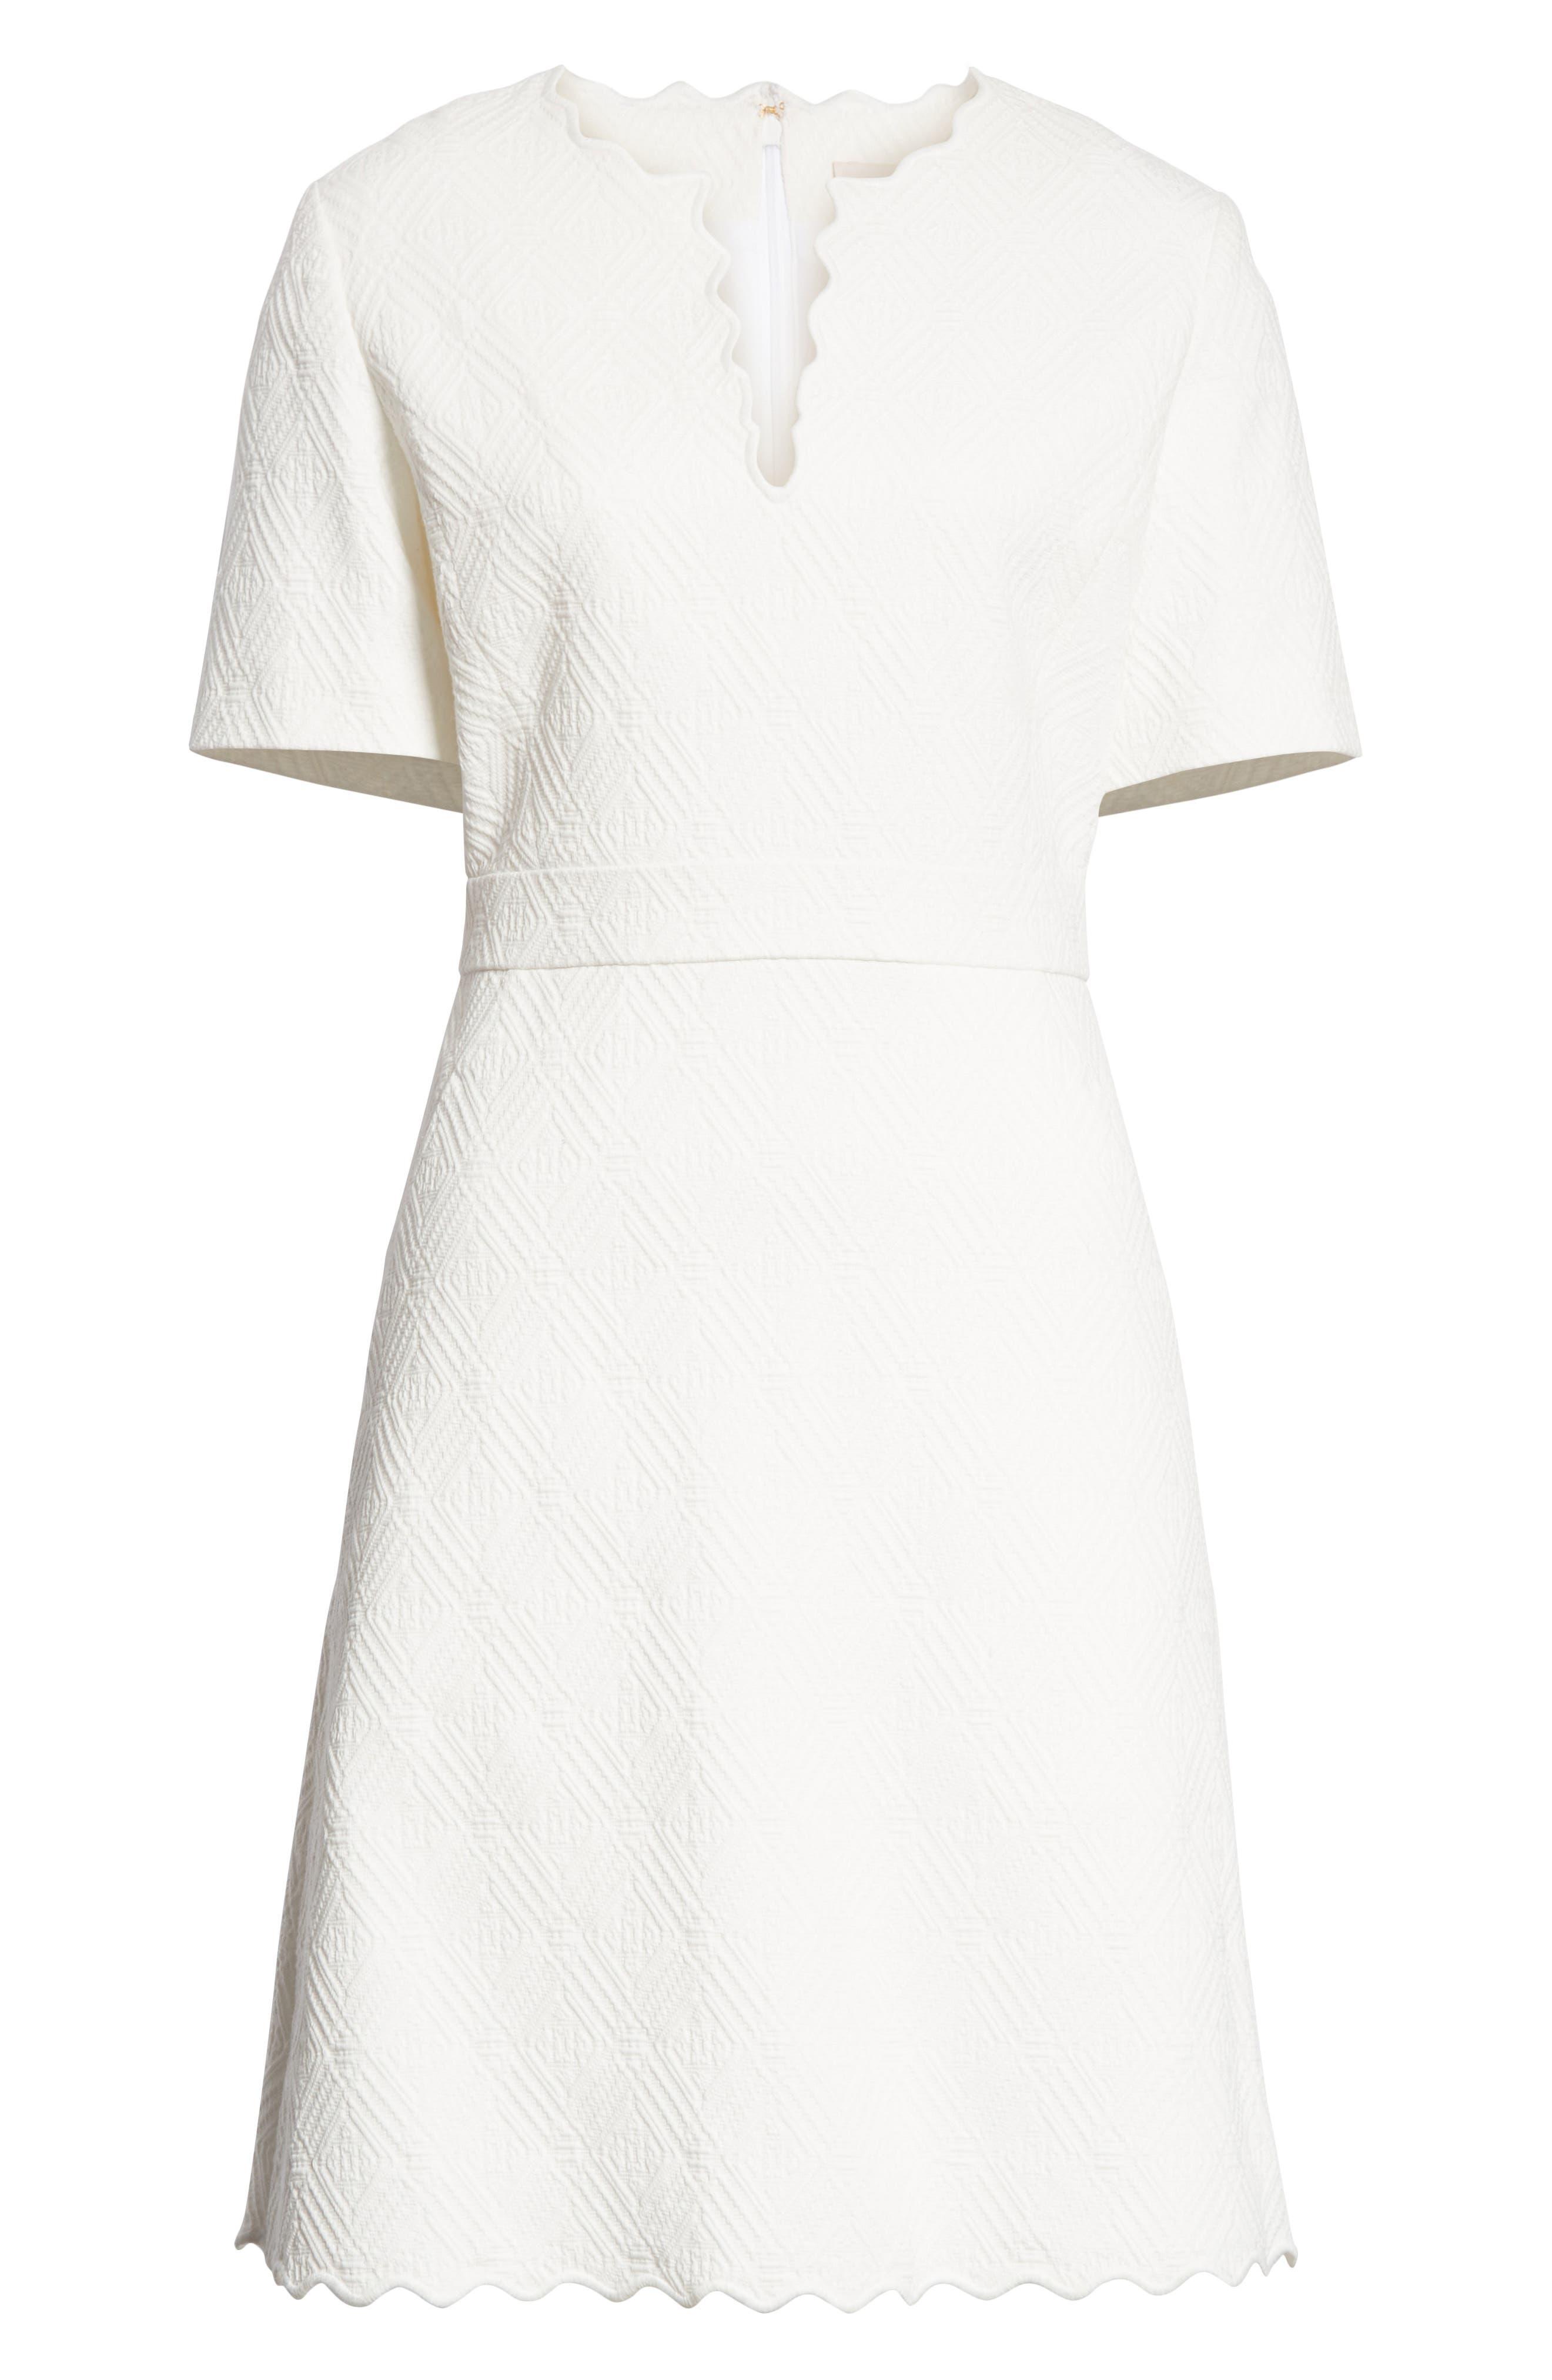 Bailey Scallop Cotton Dress,                             Alternate thumbnail 6, color,                             White